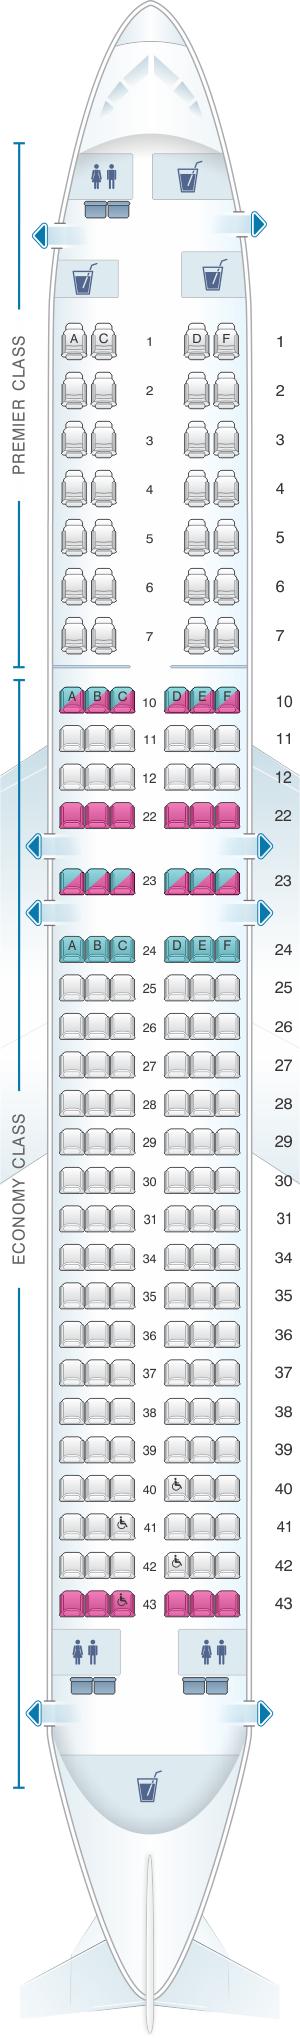 Seat map for Jet Airways Boeing B737 900 166PAX